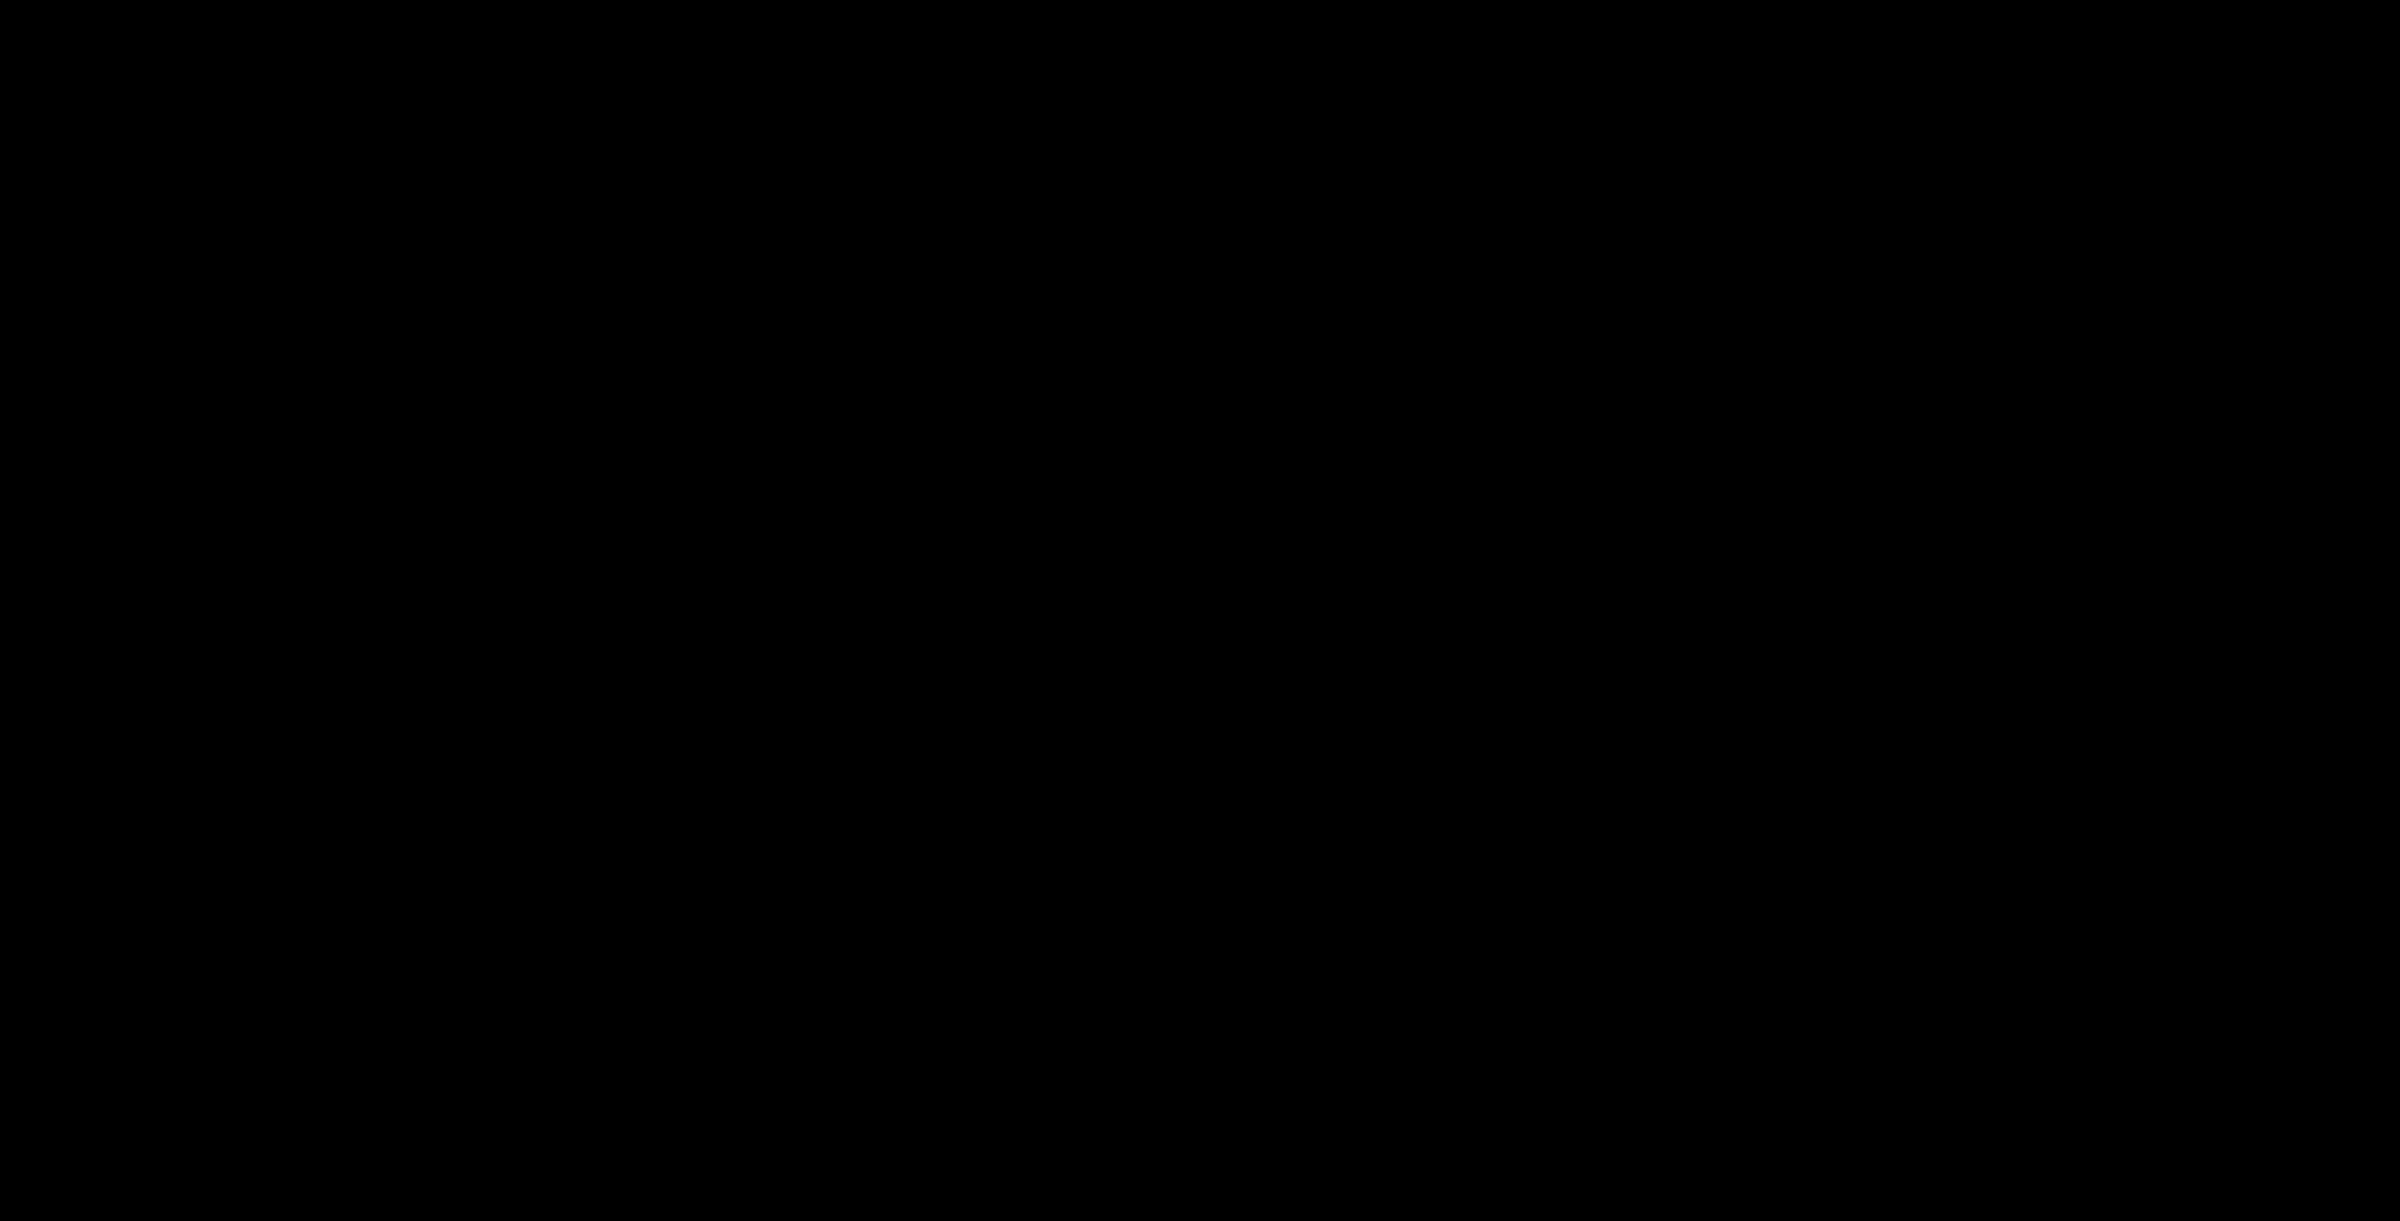 Binary clipart Panda Free code%20clipart Clipart Code